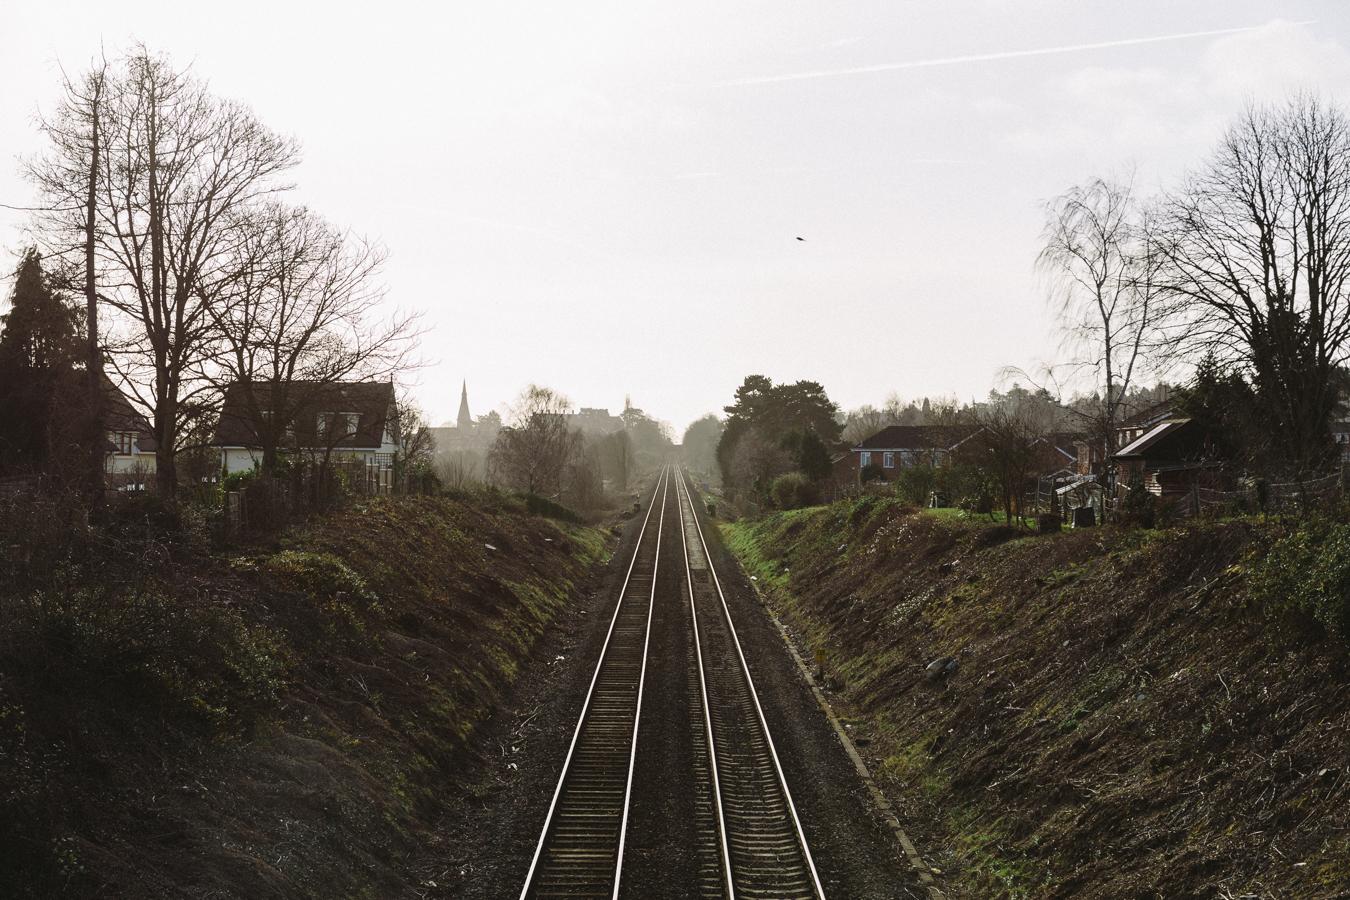 Looking down the railway line towards Great Malvern